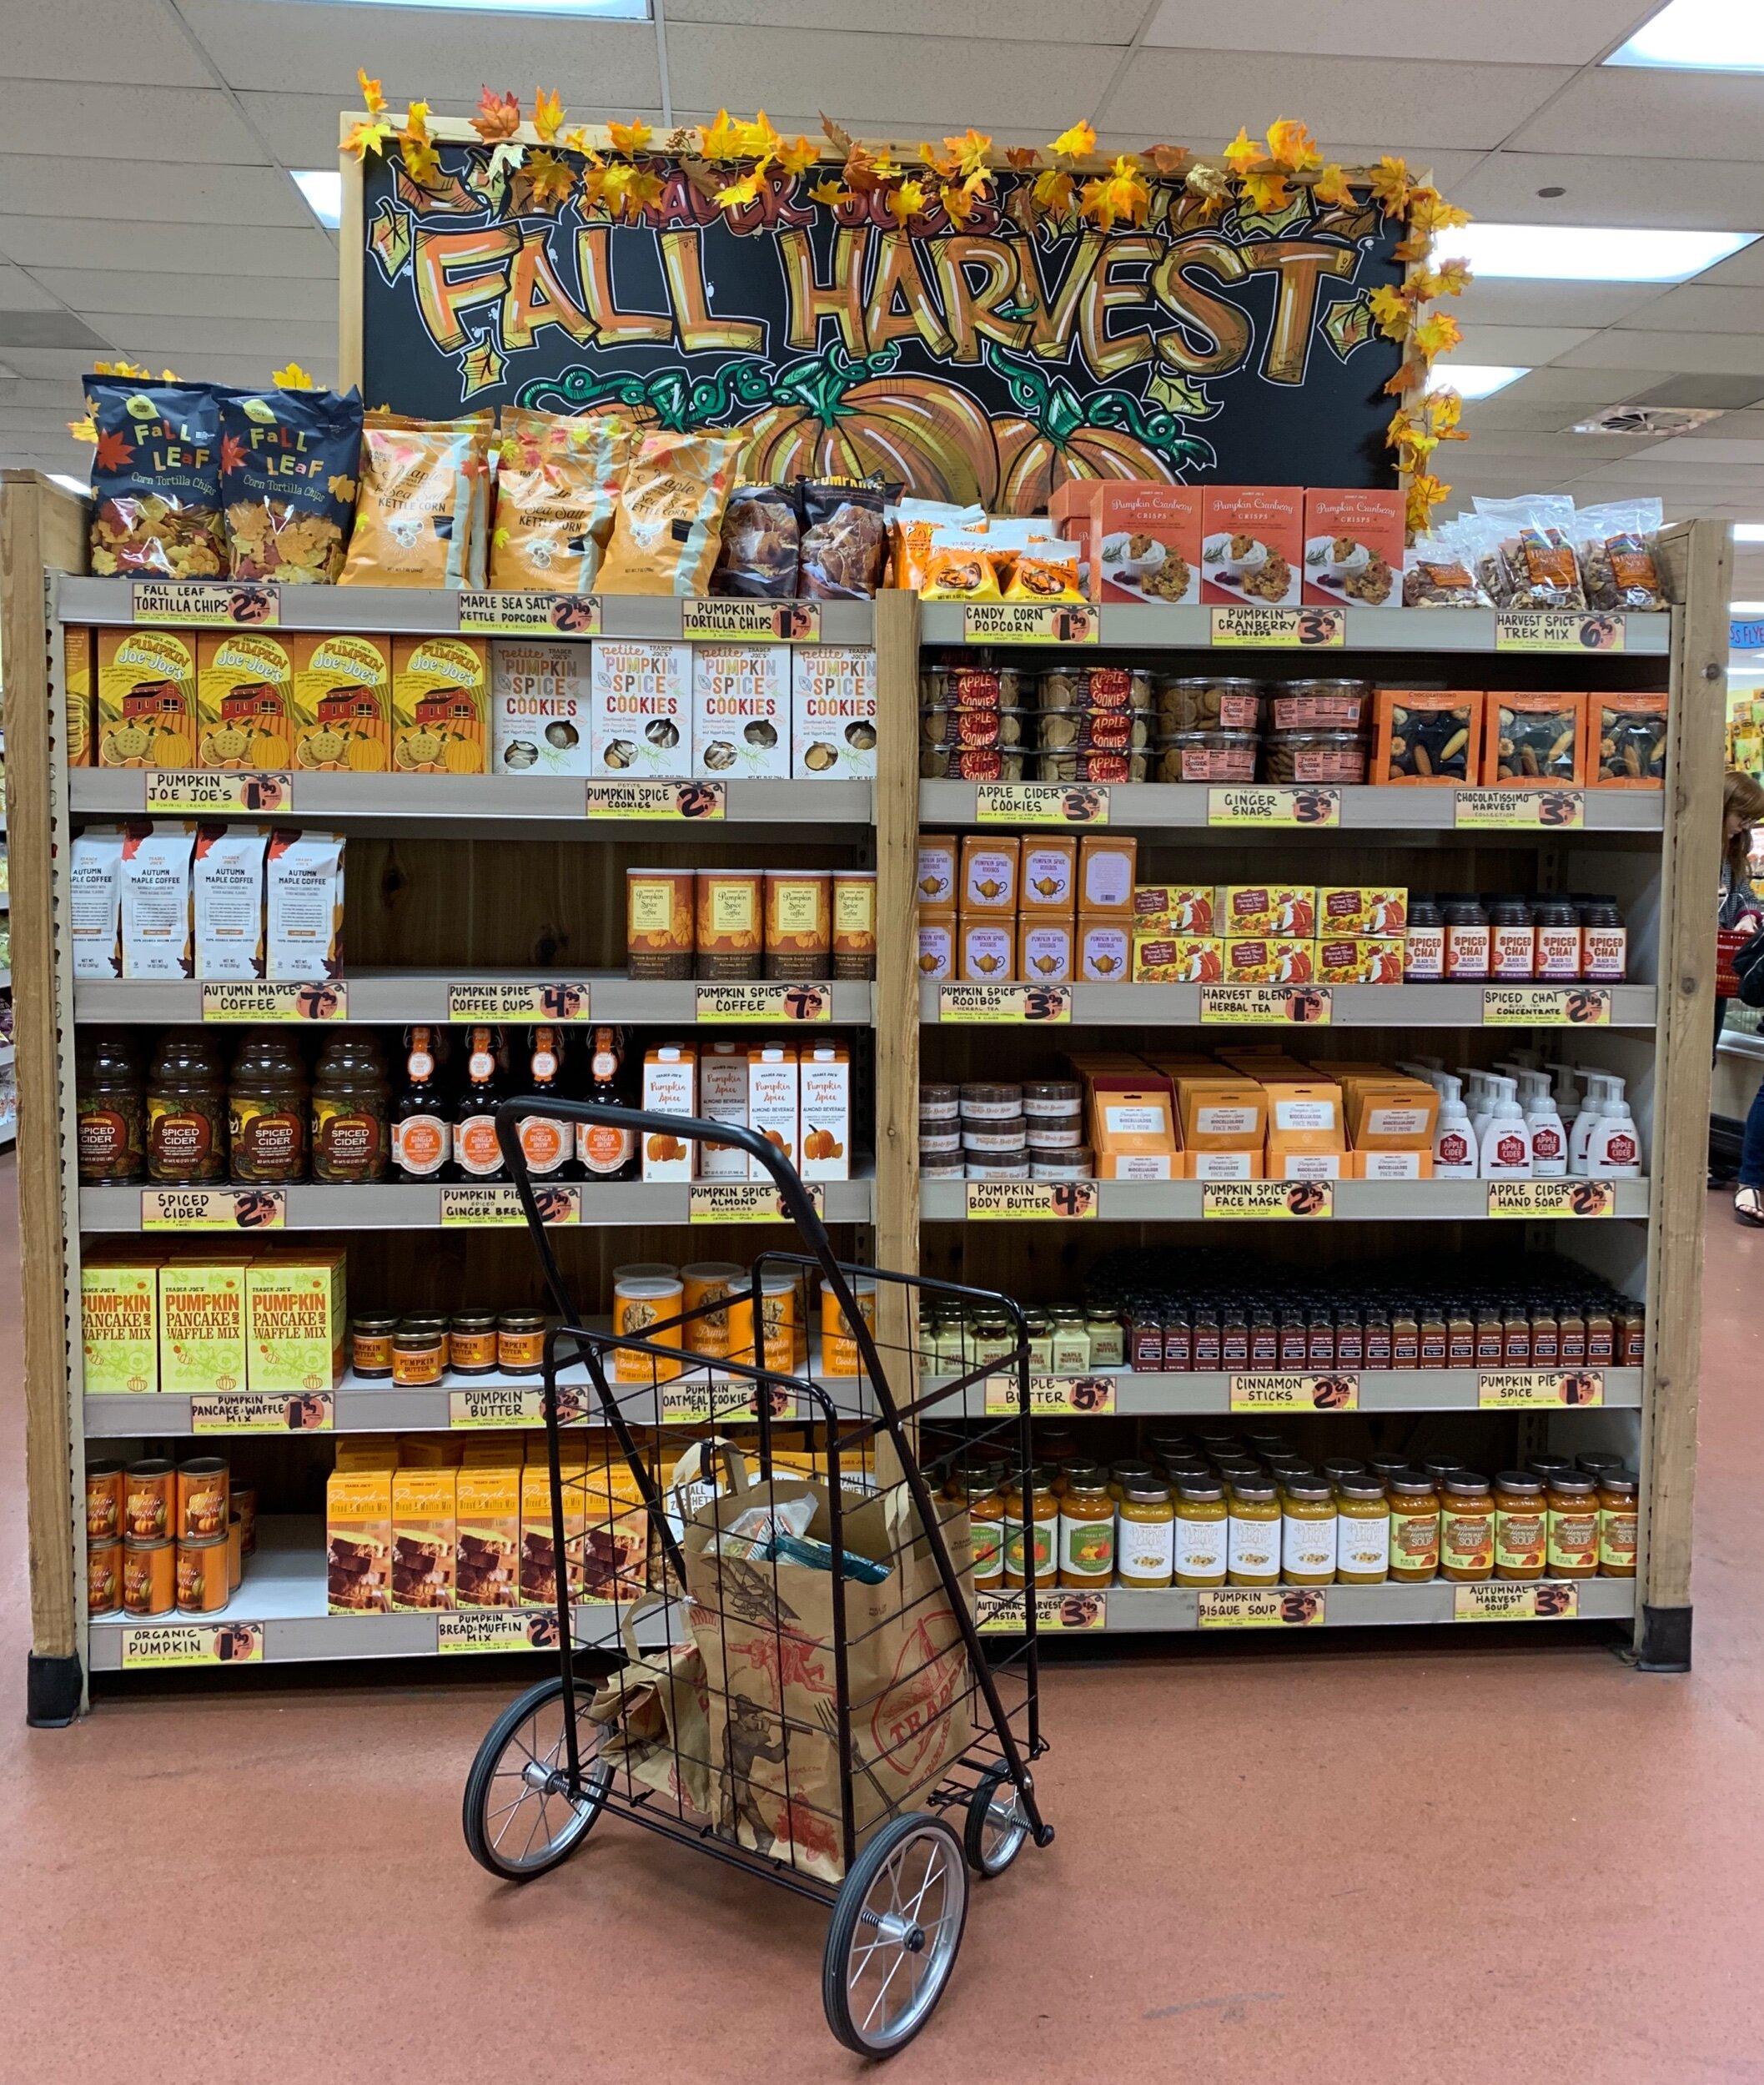 The Pumpkin Spice section at Trader Joe's